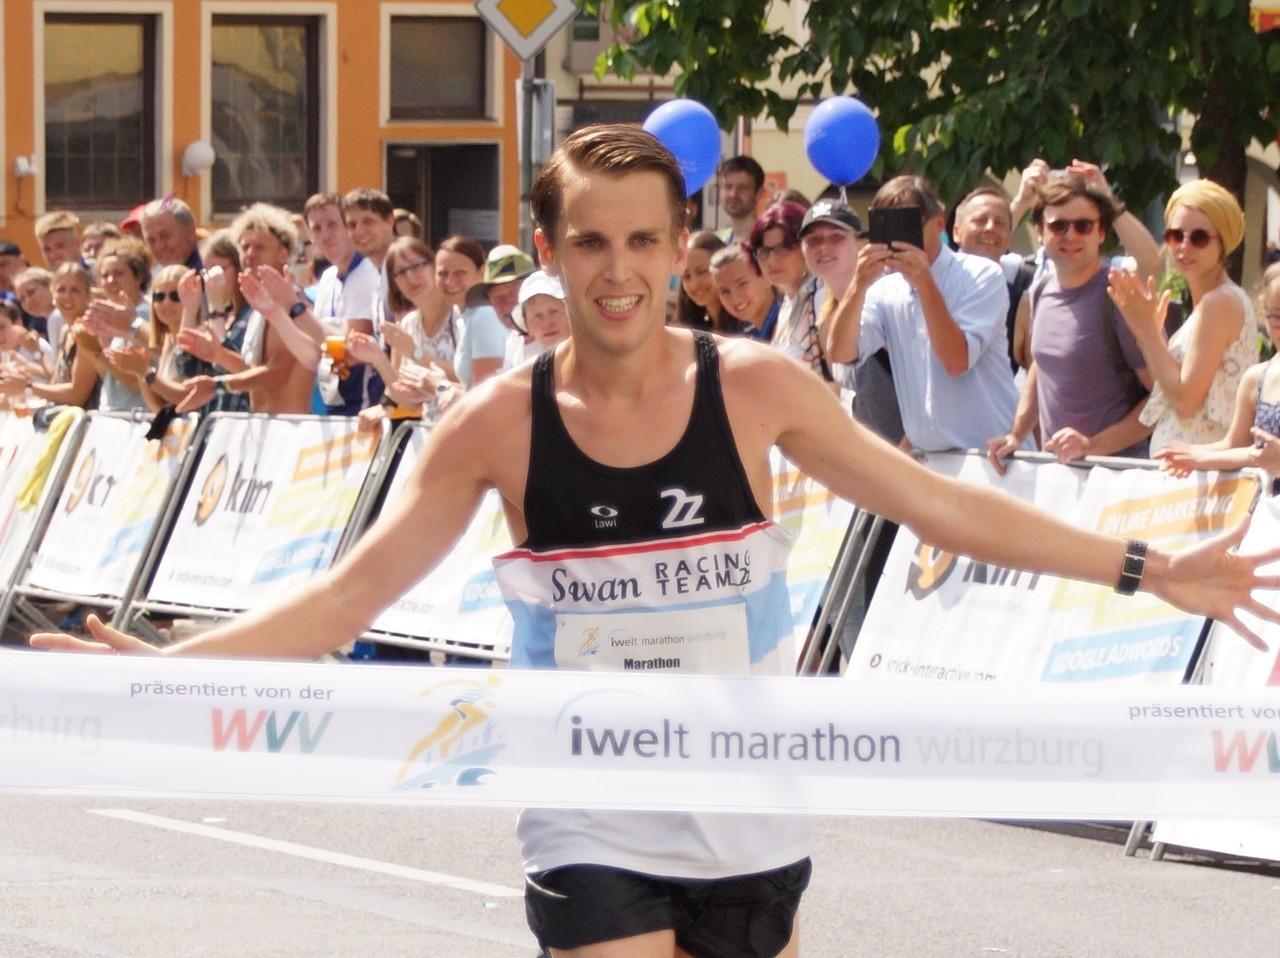 DSC01176-Mayer_Marius_iwelt_marathon_2018